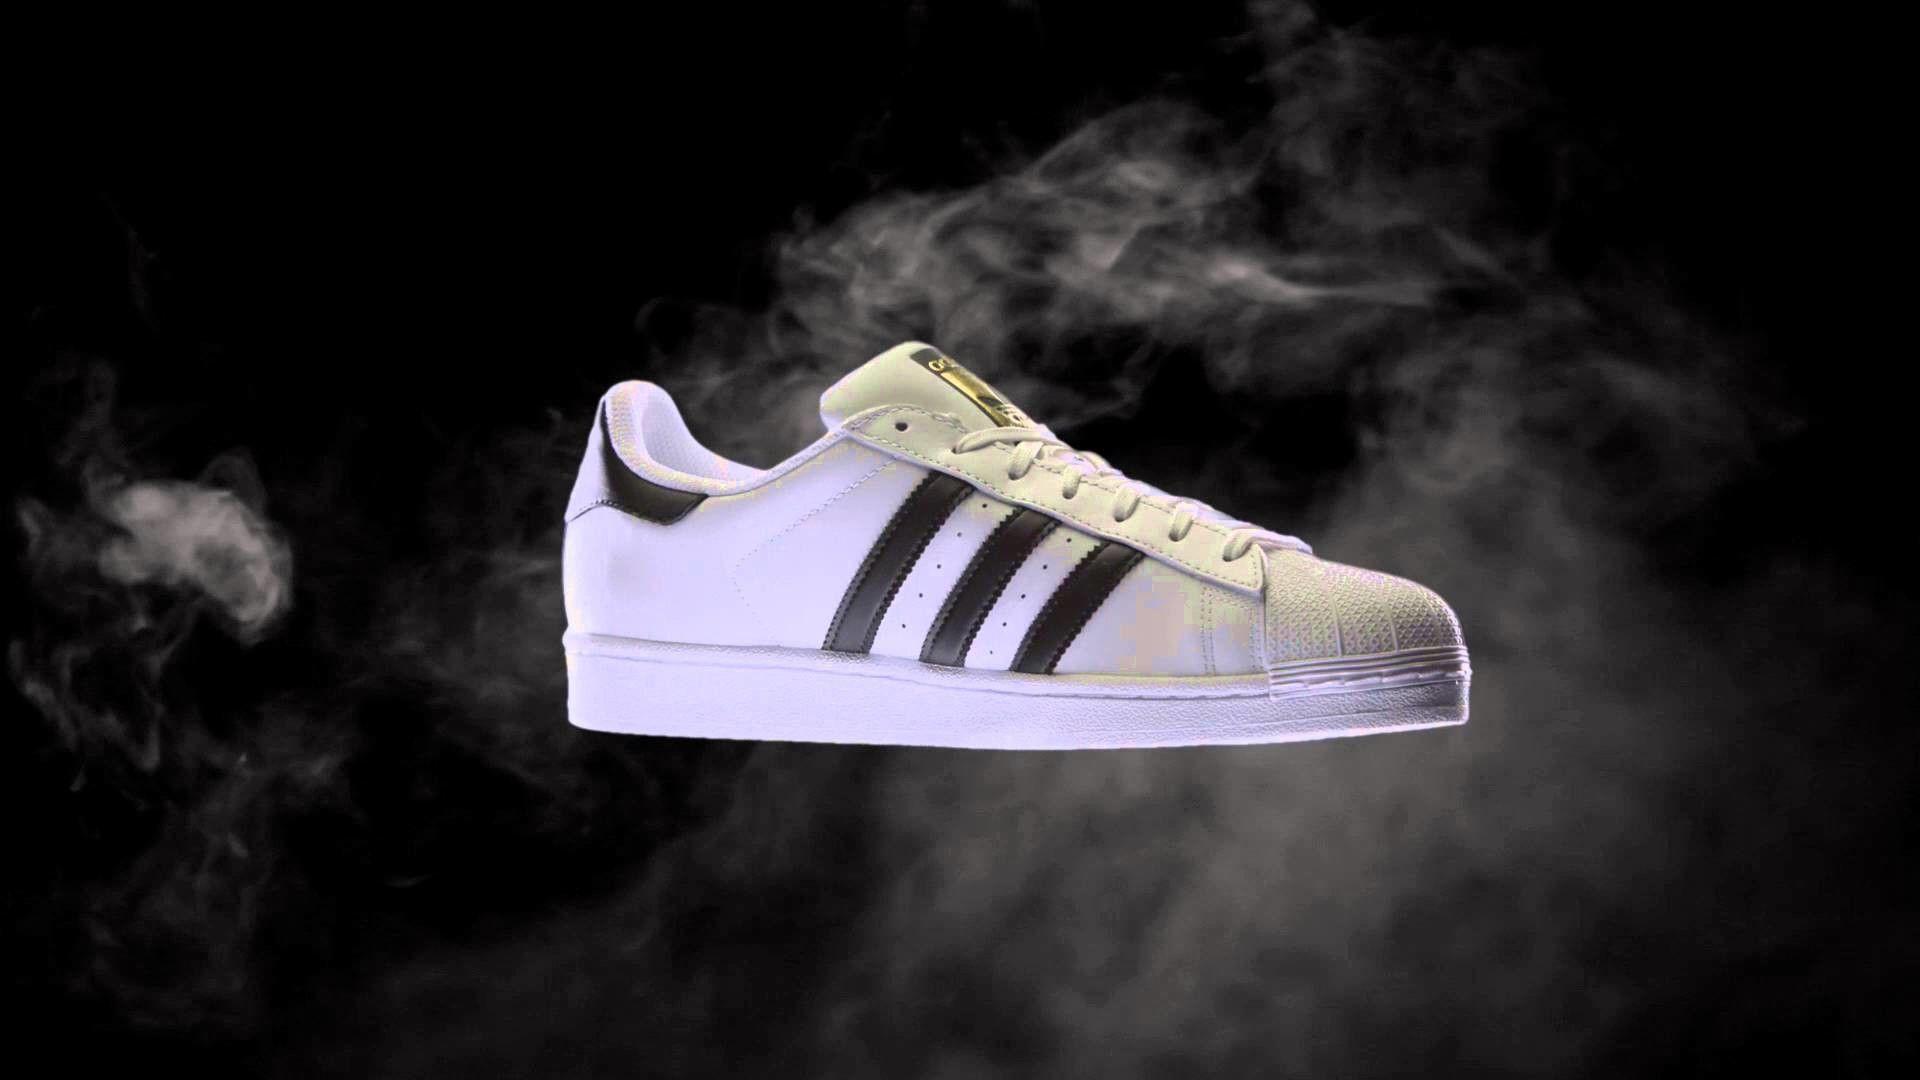 Adidas Superstar Wallpapers Top Free Adidas Superstar